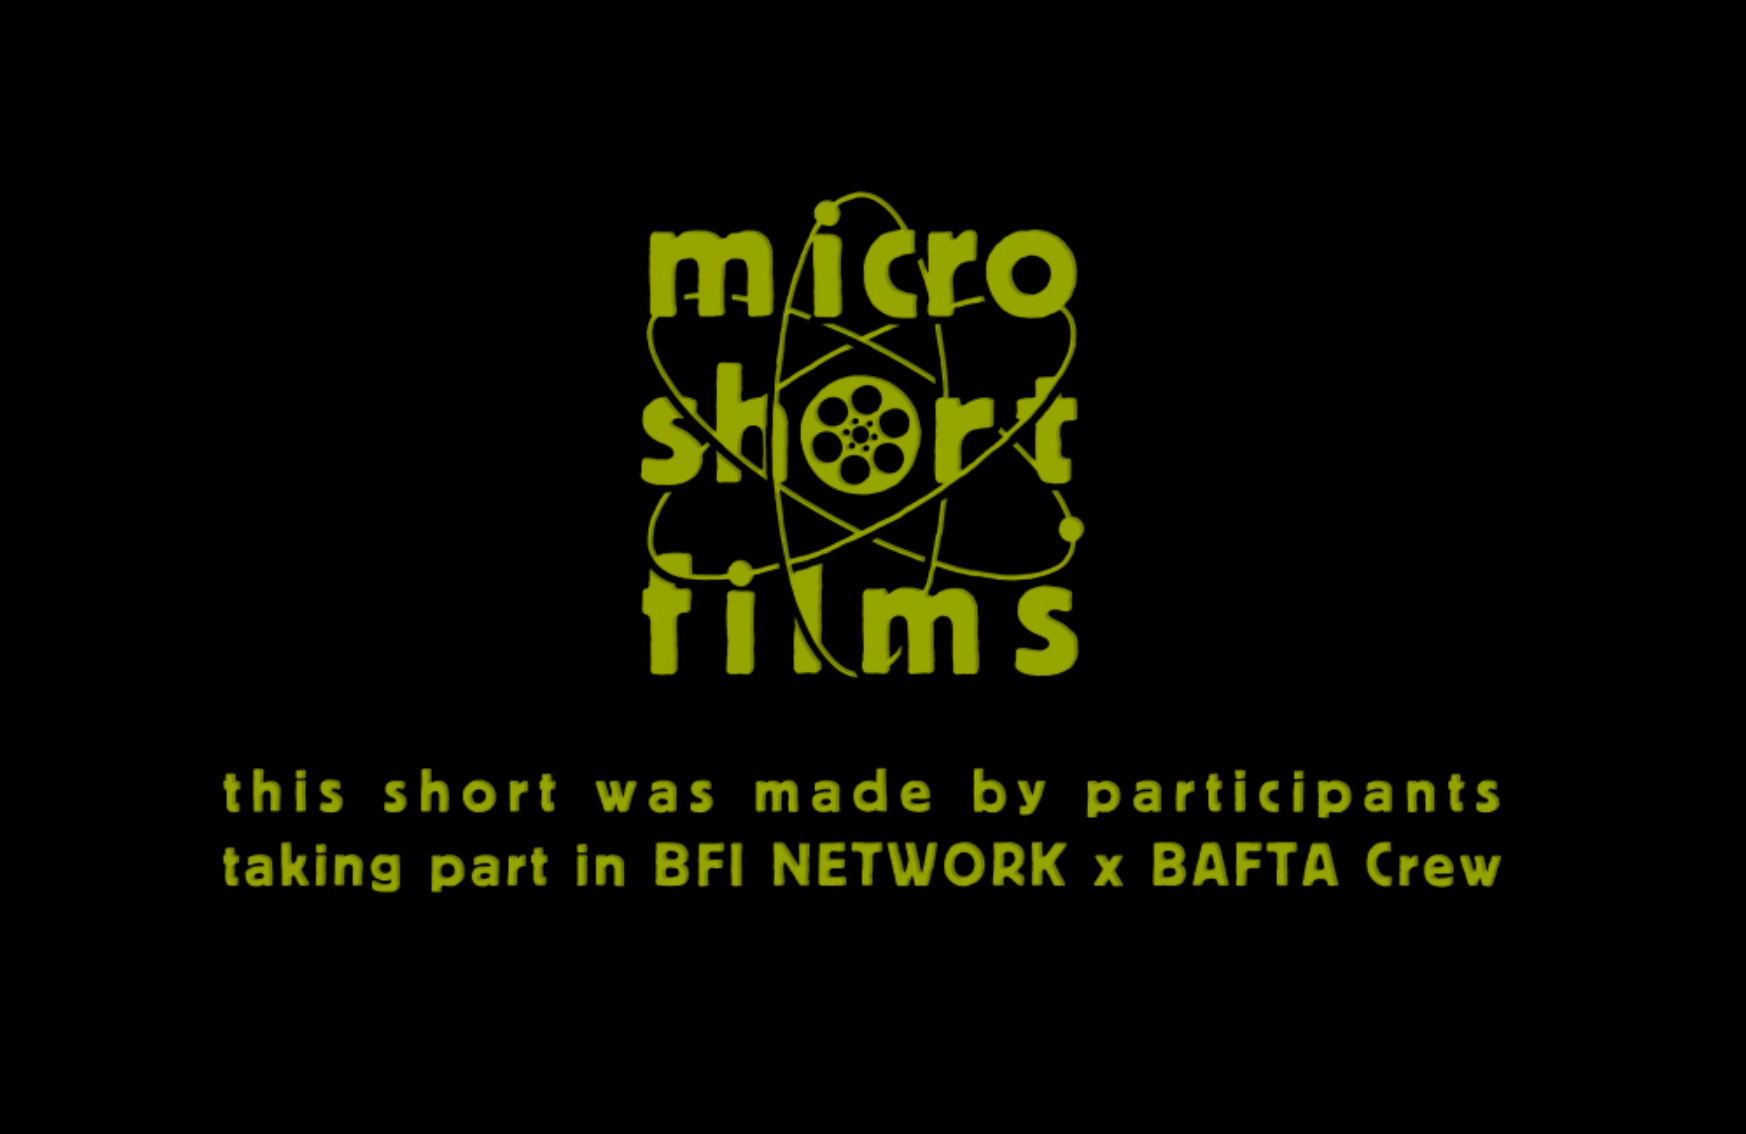 Suction – Micro short film